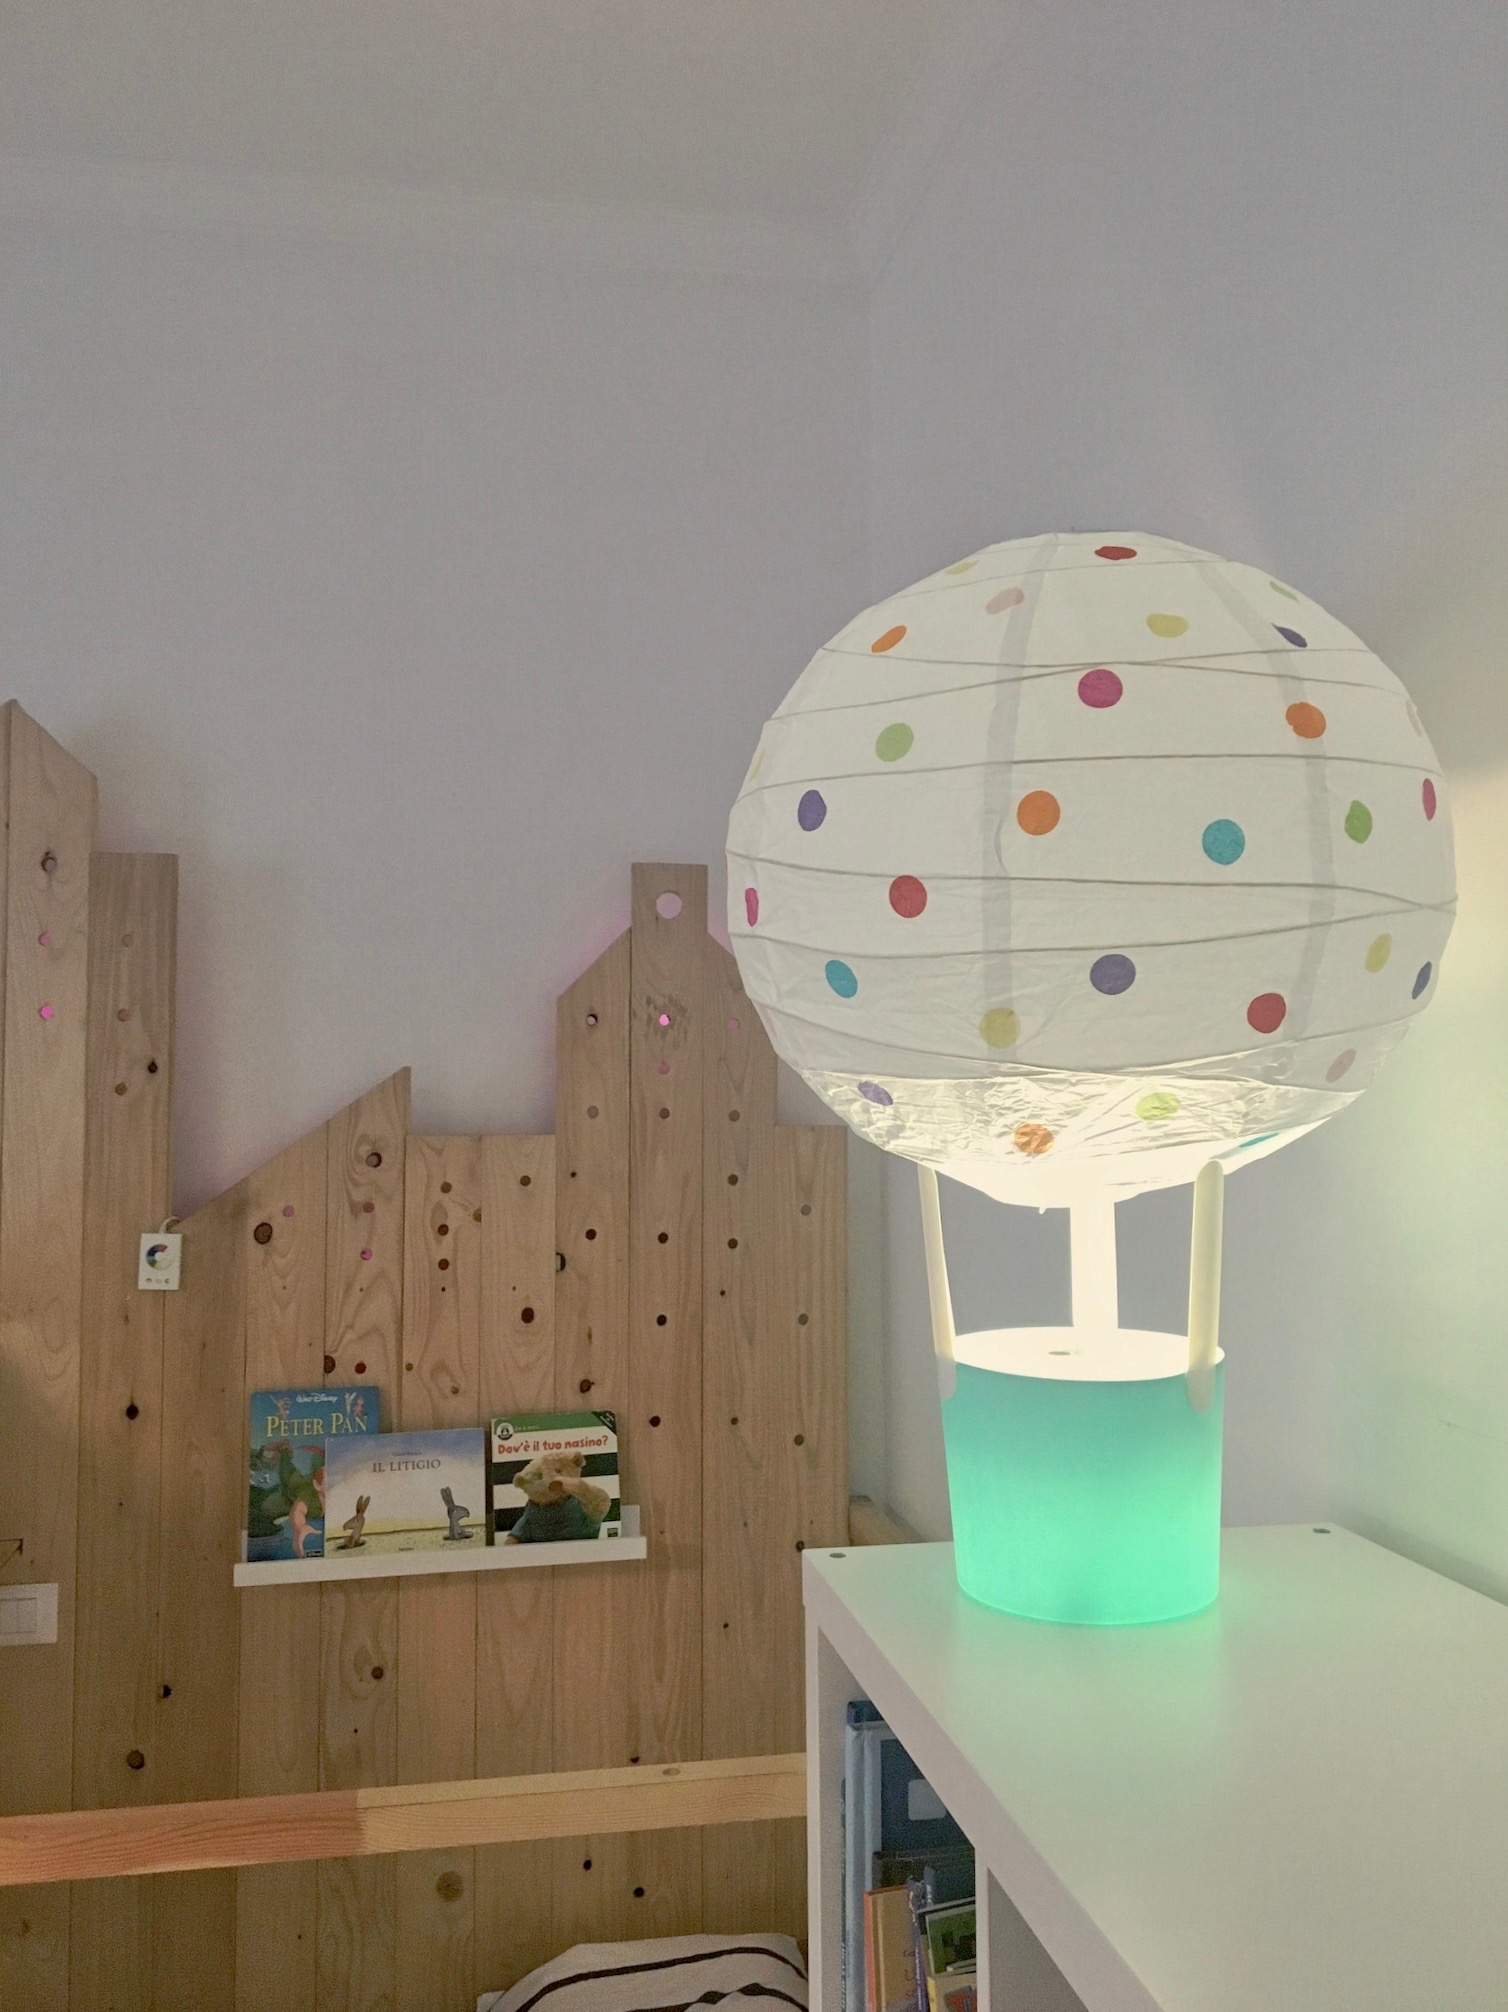 ikea lighting hack. Mommo Design: IKEA LAMPS HACKS Ikea Lighting Hack A